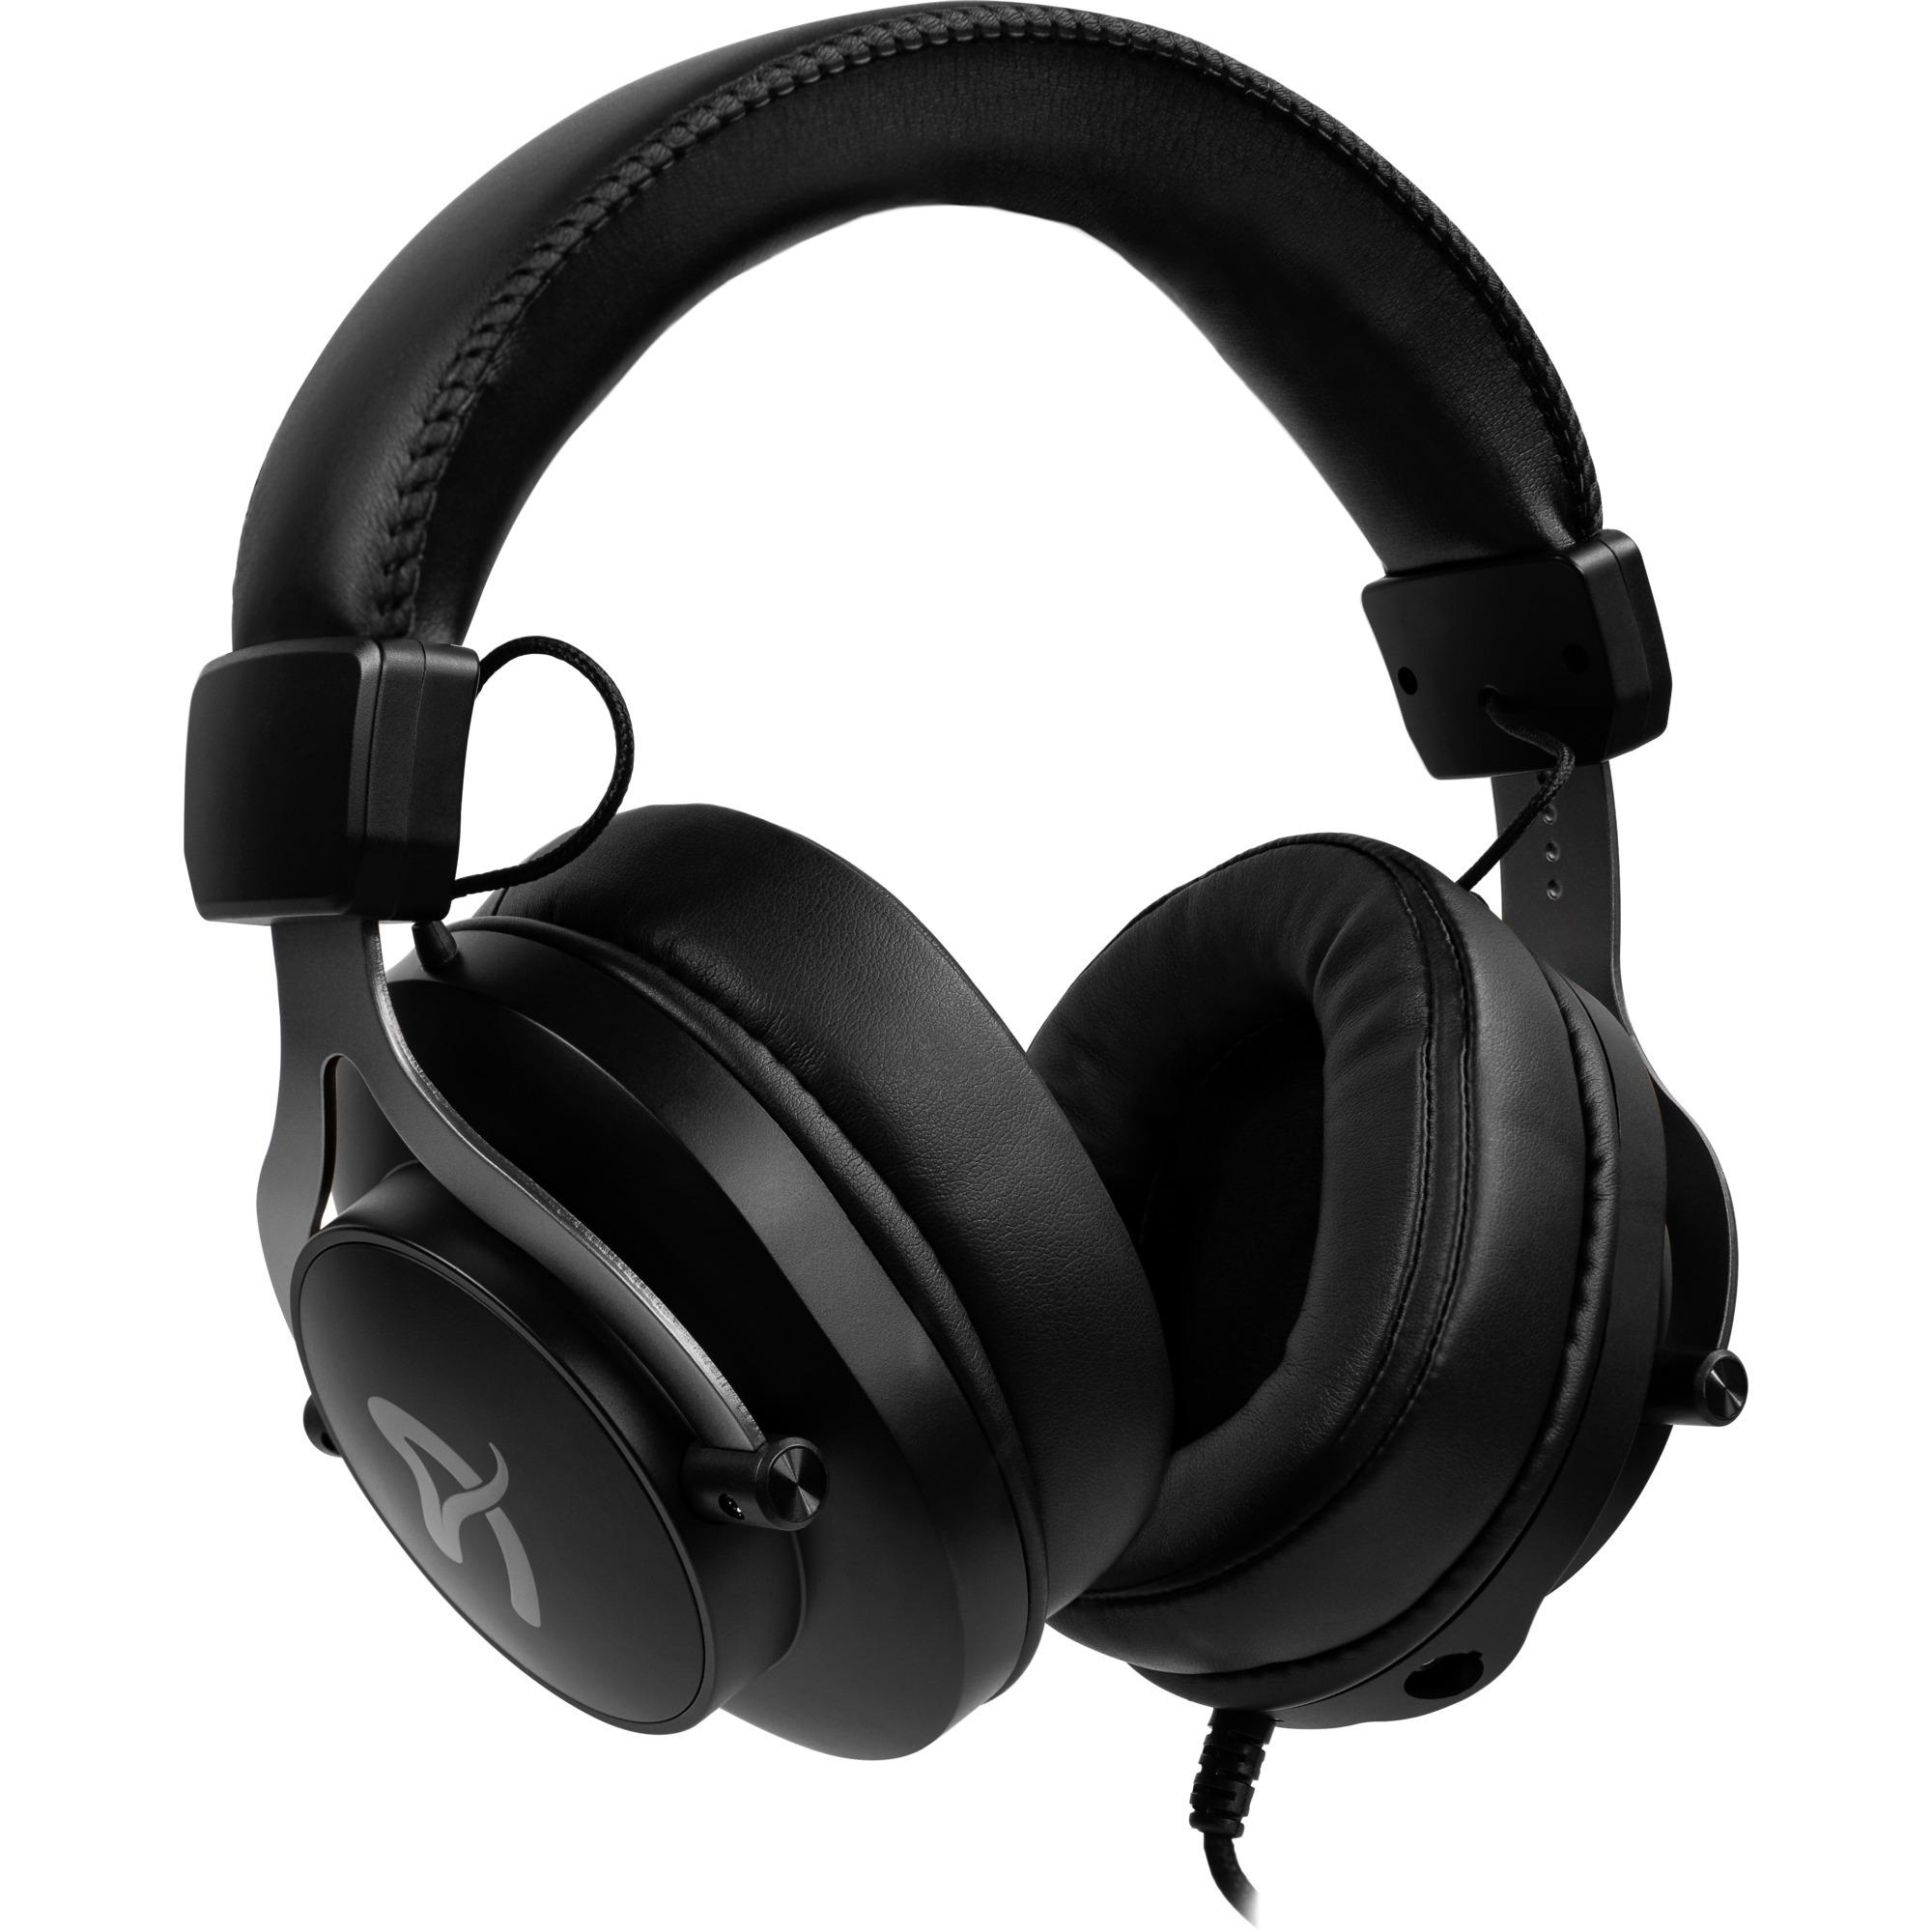 Image of ARIA, Gaming-Headset